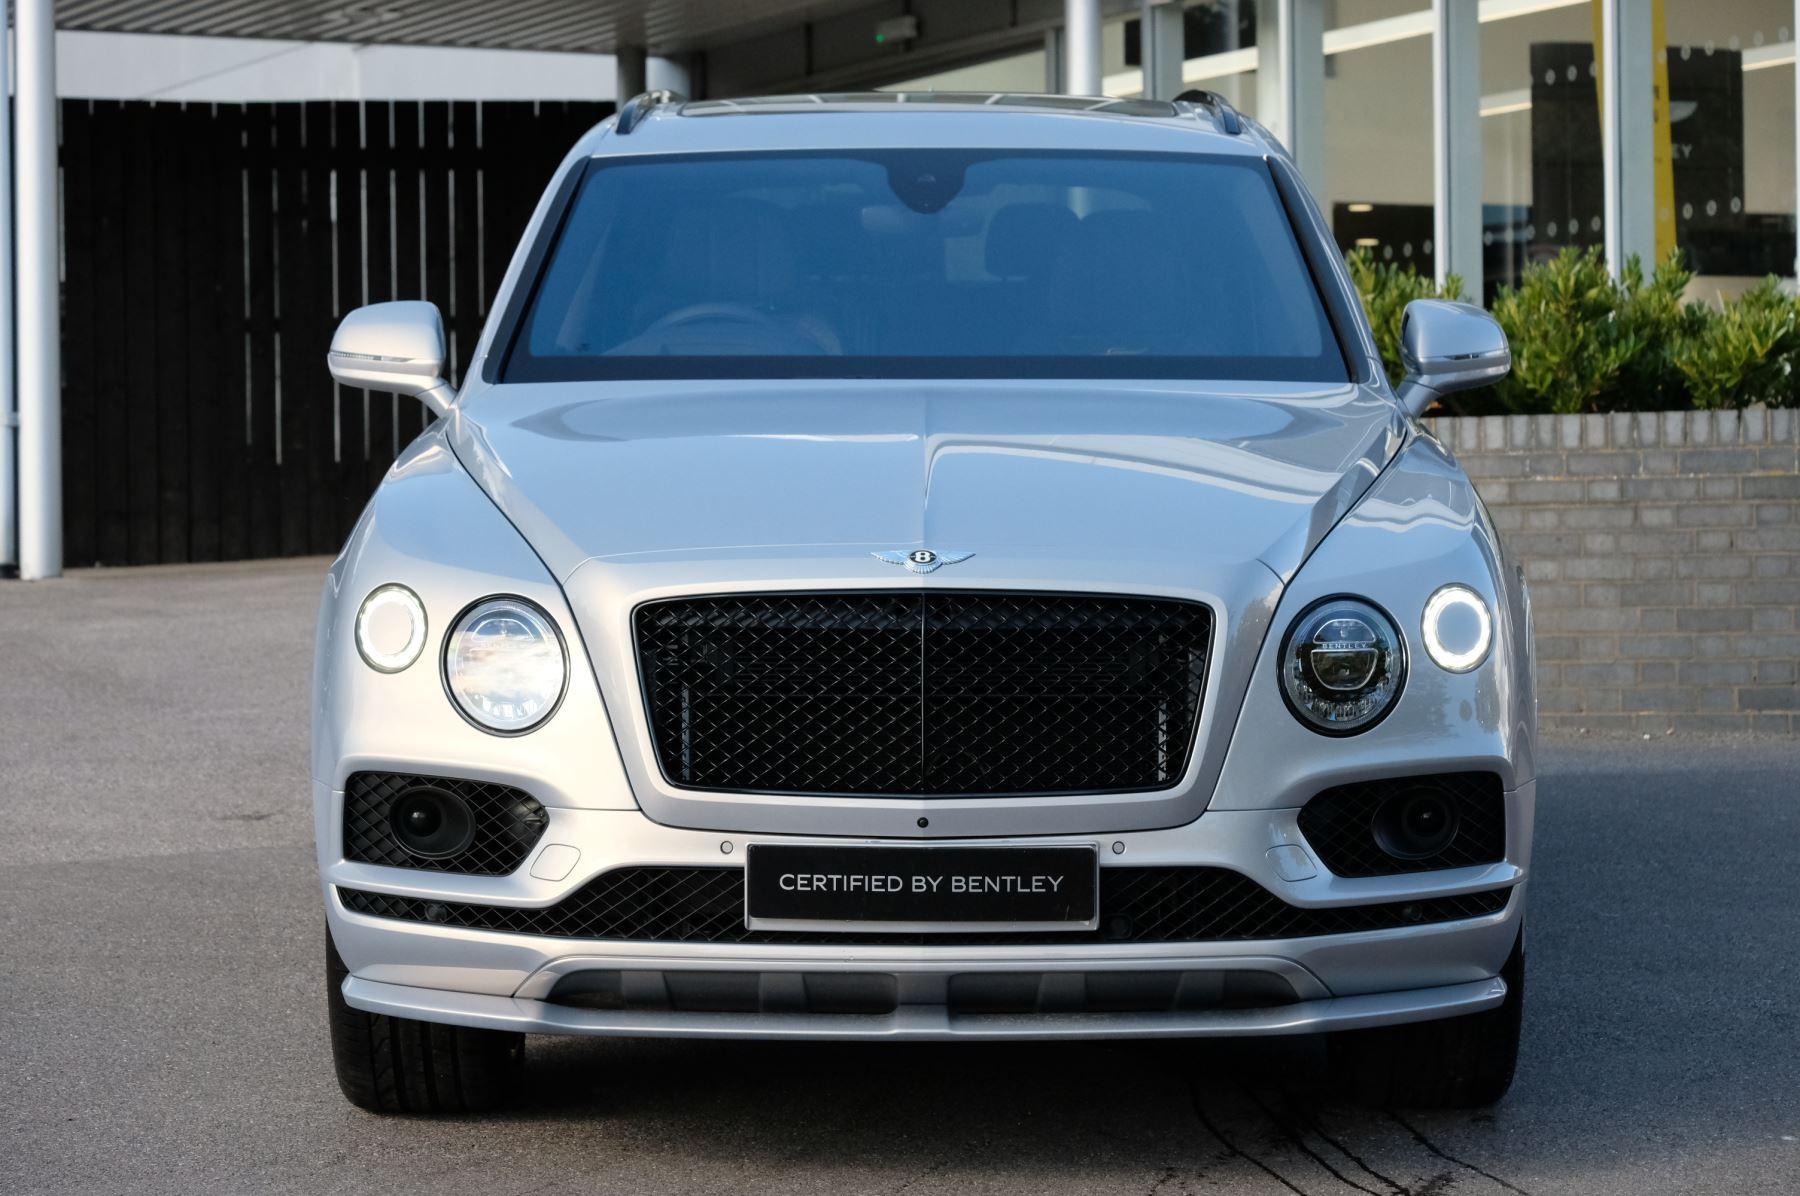 Bentley Bentayga Speed - City & Touring image 2